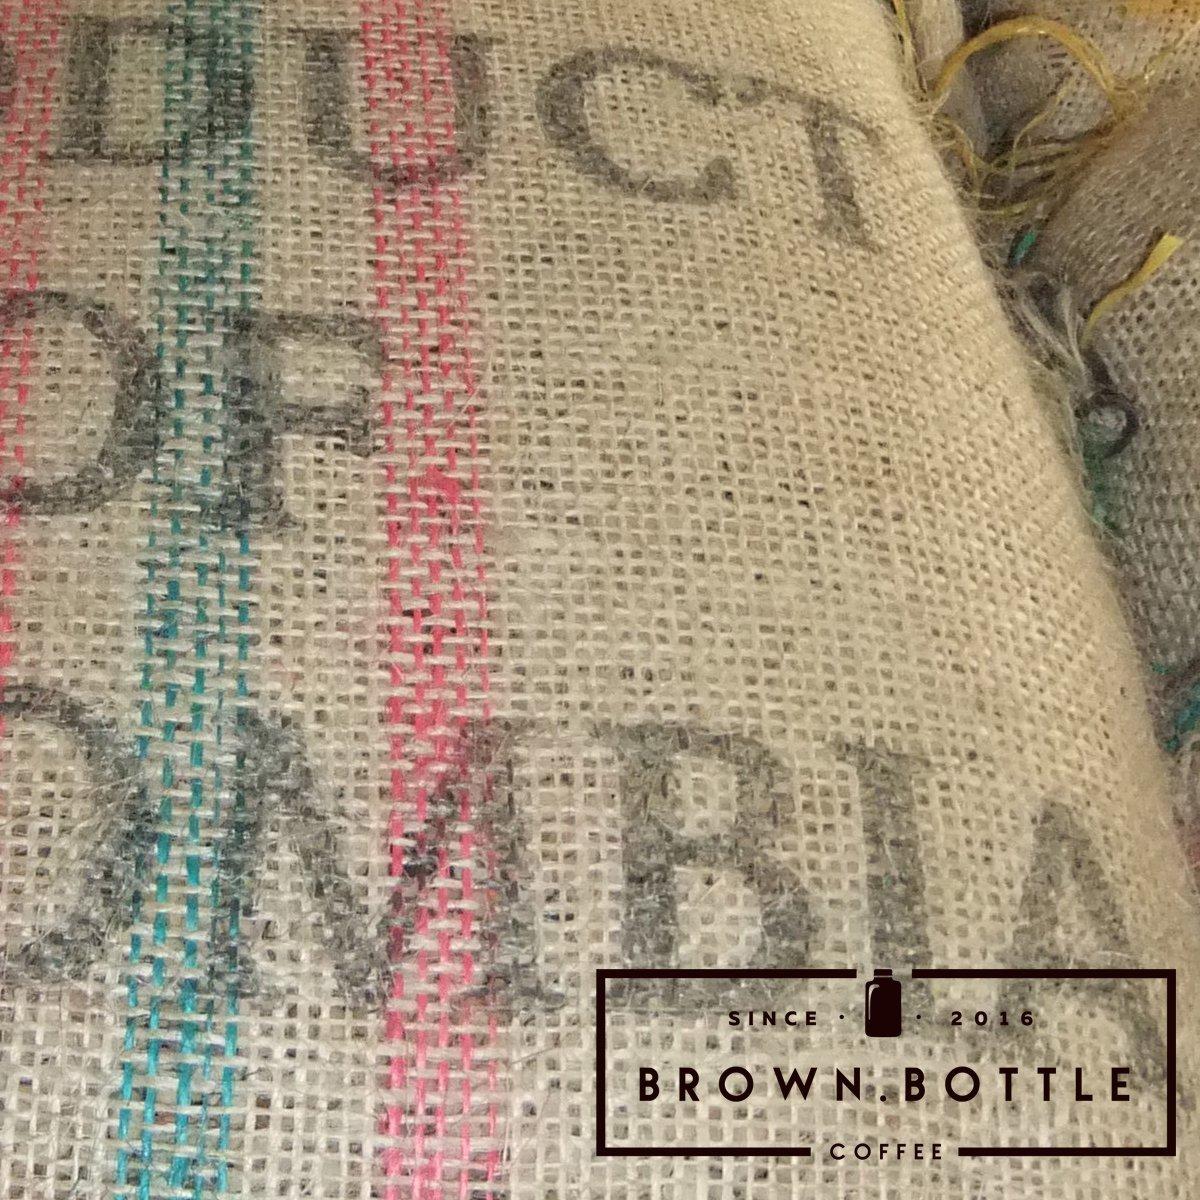 Colombian-Green-Coffee-Beans-100-Arabica-Speciality-Green-Coffee-Beans-From-Colombia-For-Home-Roasting